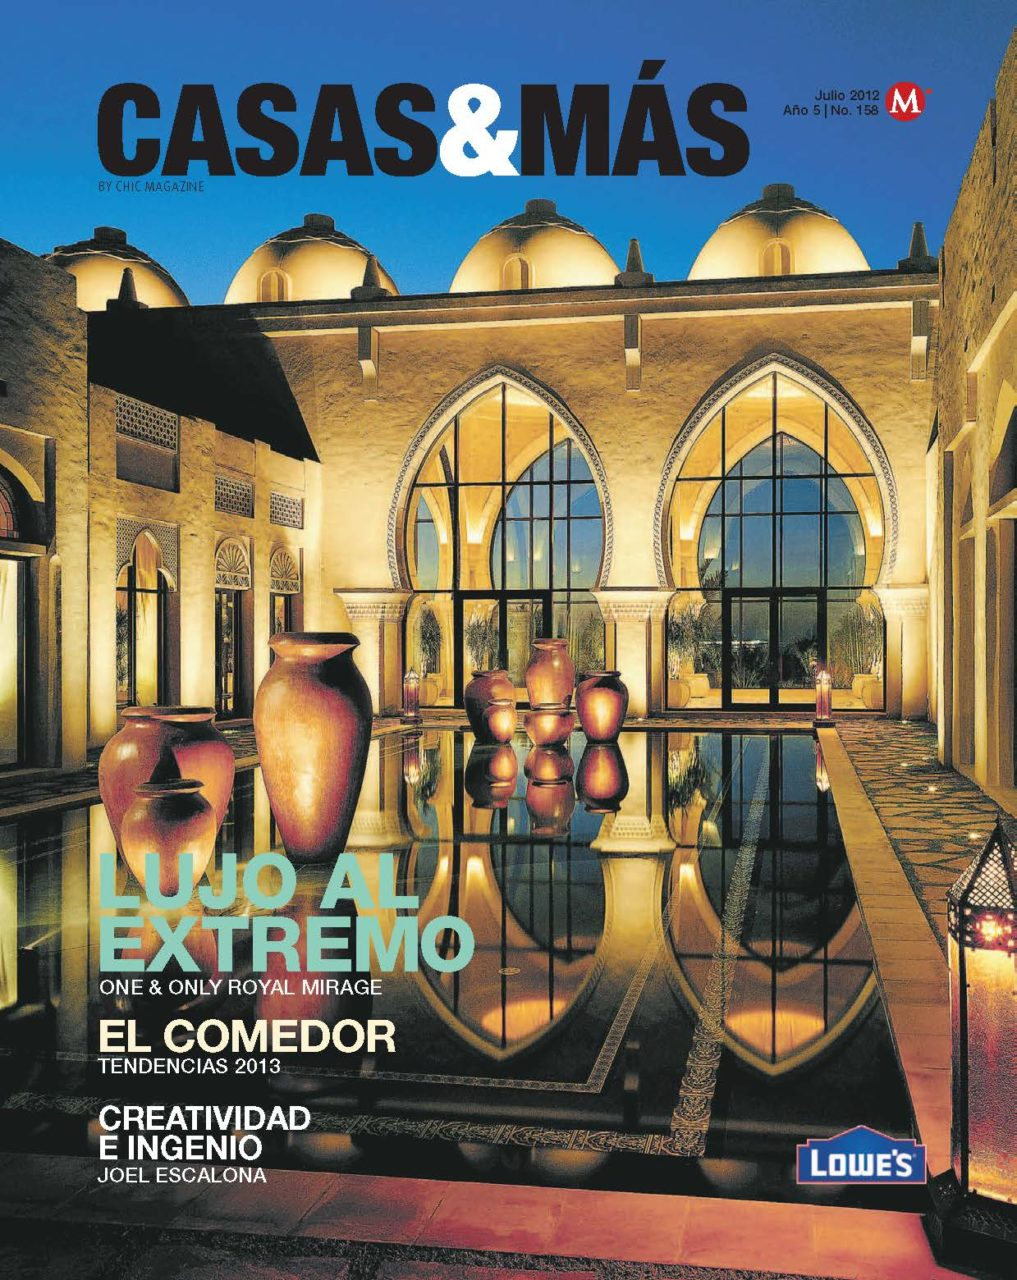 https://www.saota.com/wp-content/uploads/2018/01/2012_July_CasasMas_SAOTA_Page_1.jpg